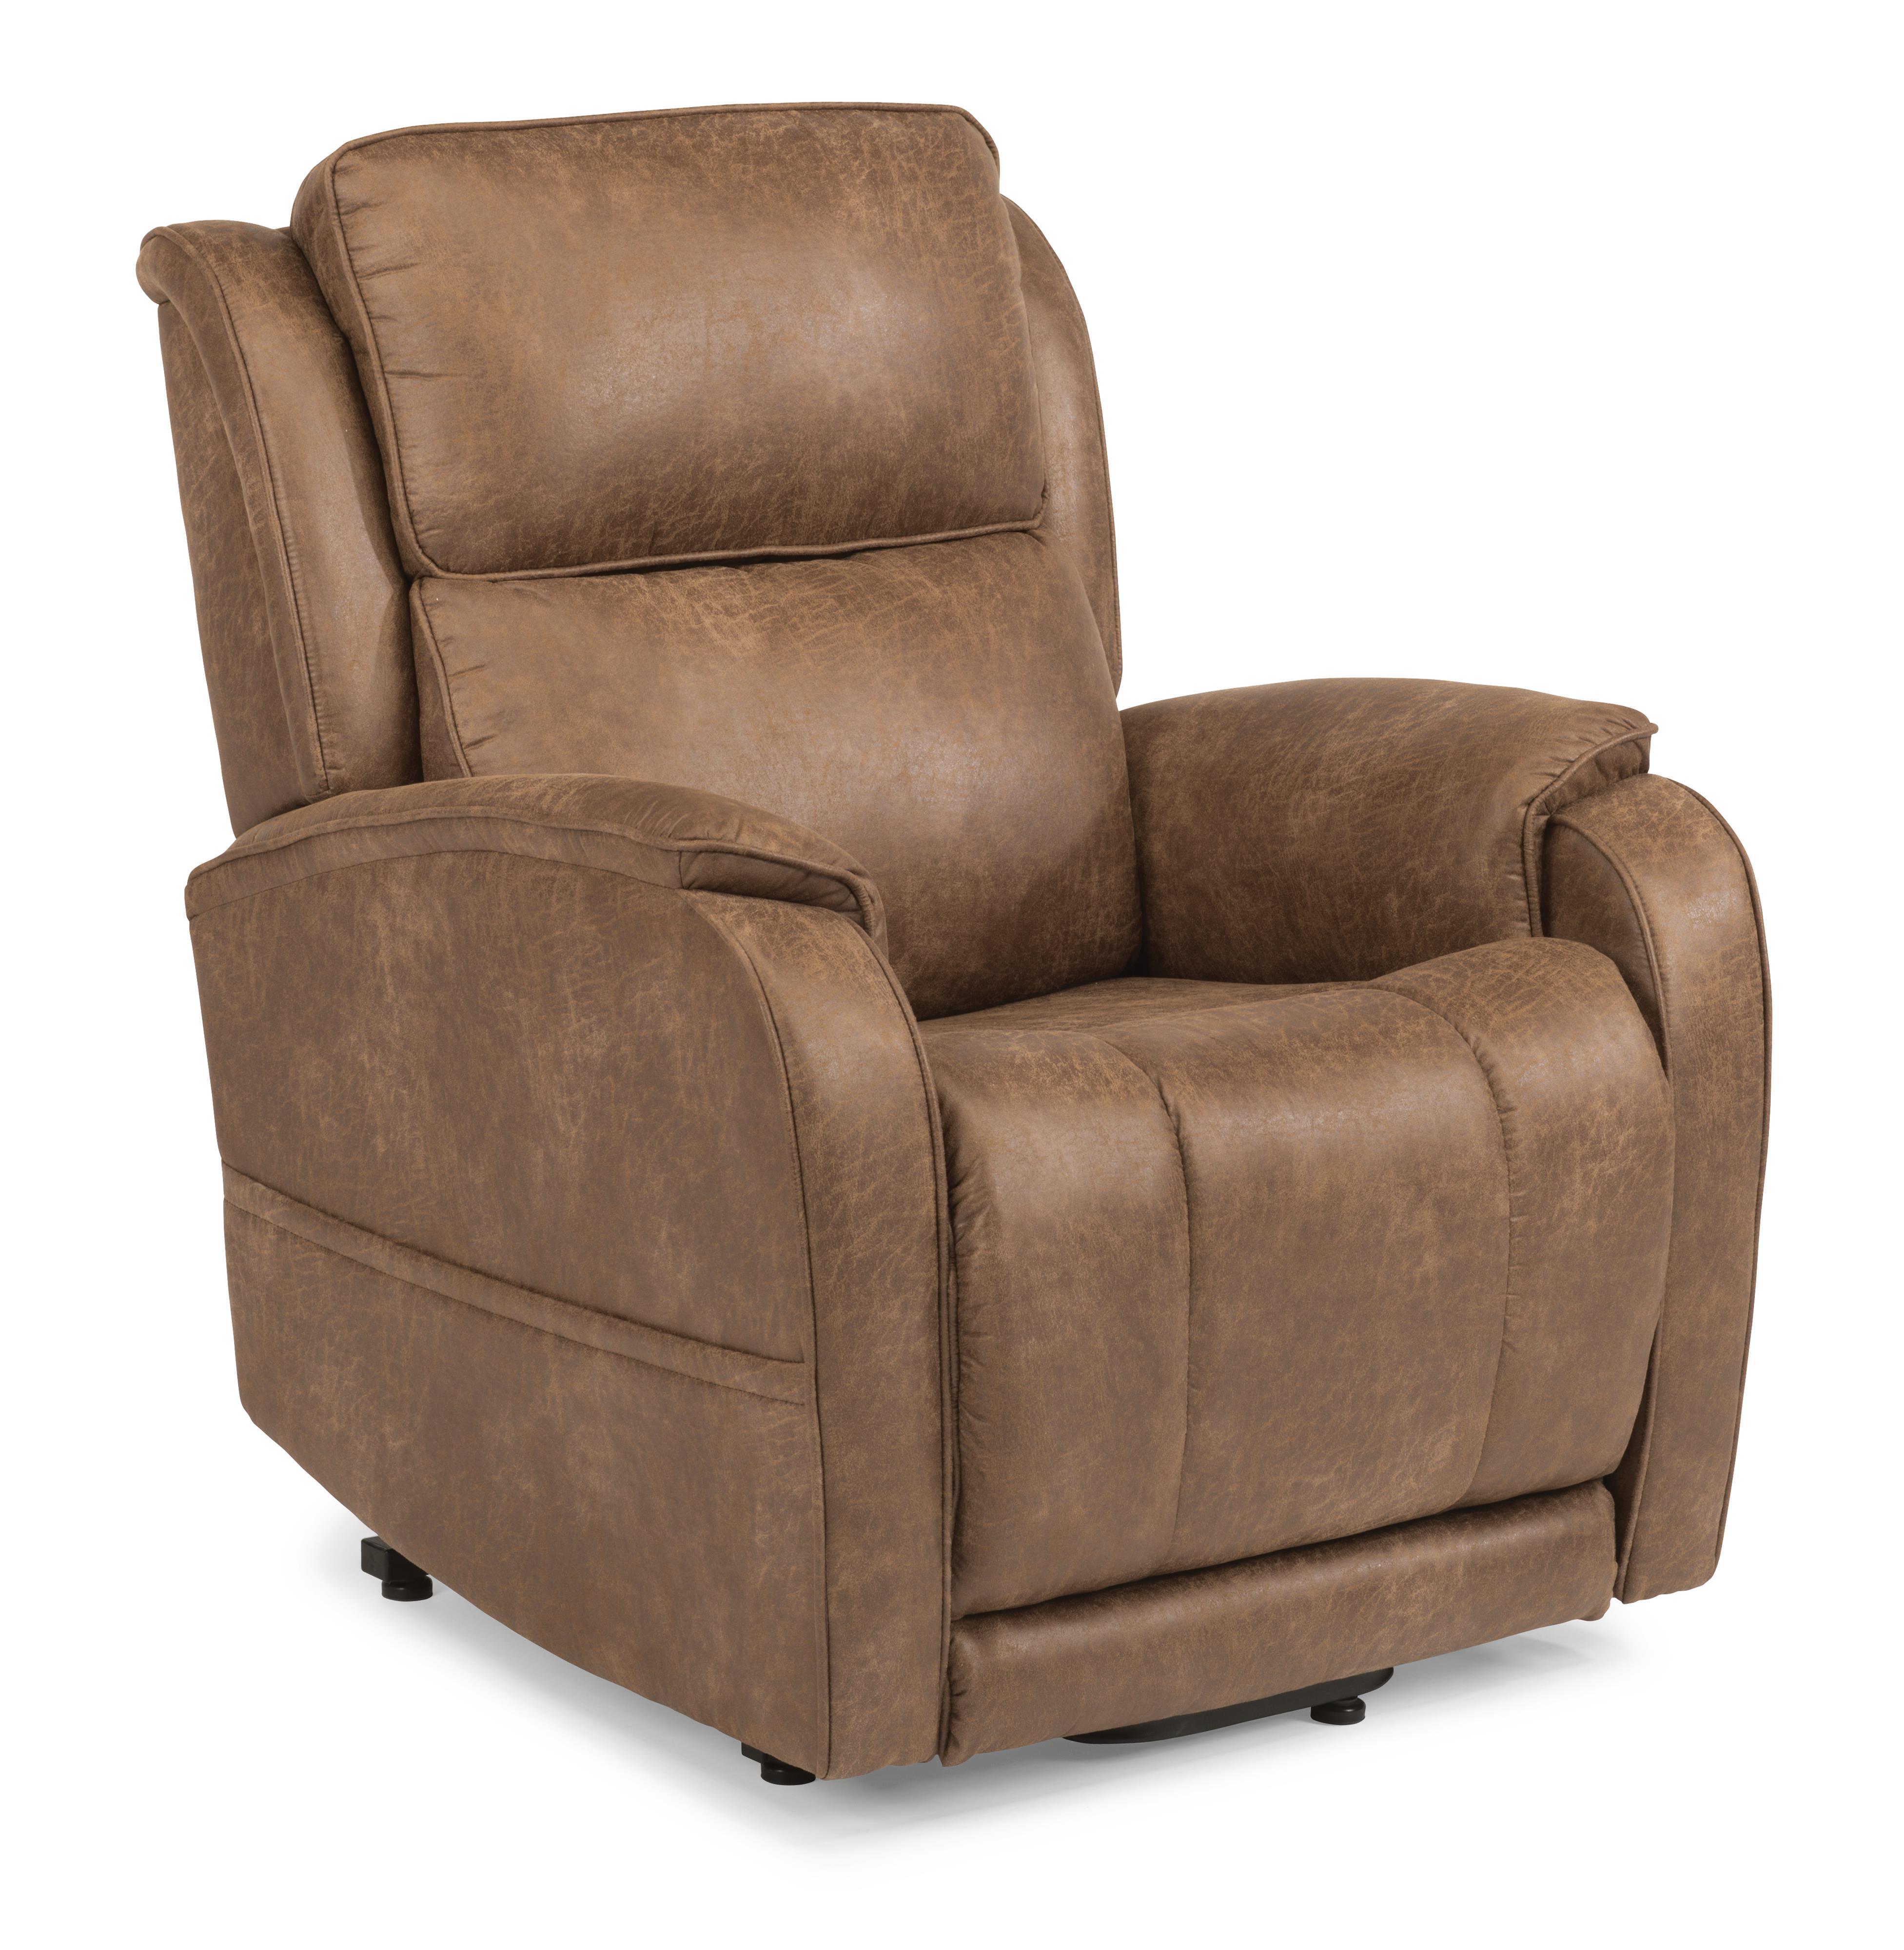 Flexsteel Latitudes Lift Chairs Power Lift Recliner - Item Number: 1905-55S-861-72